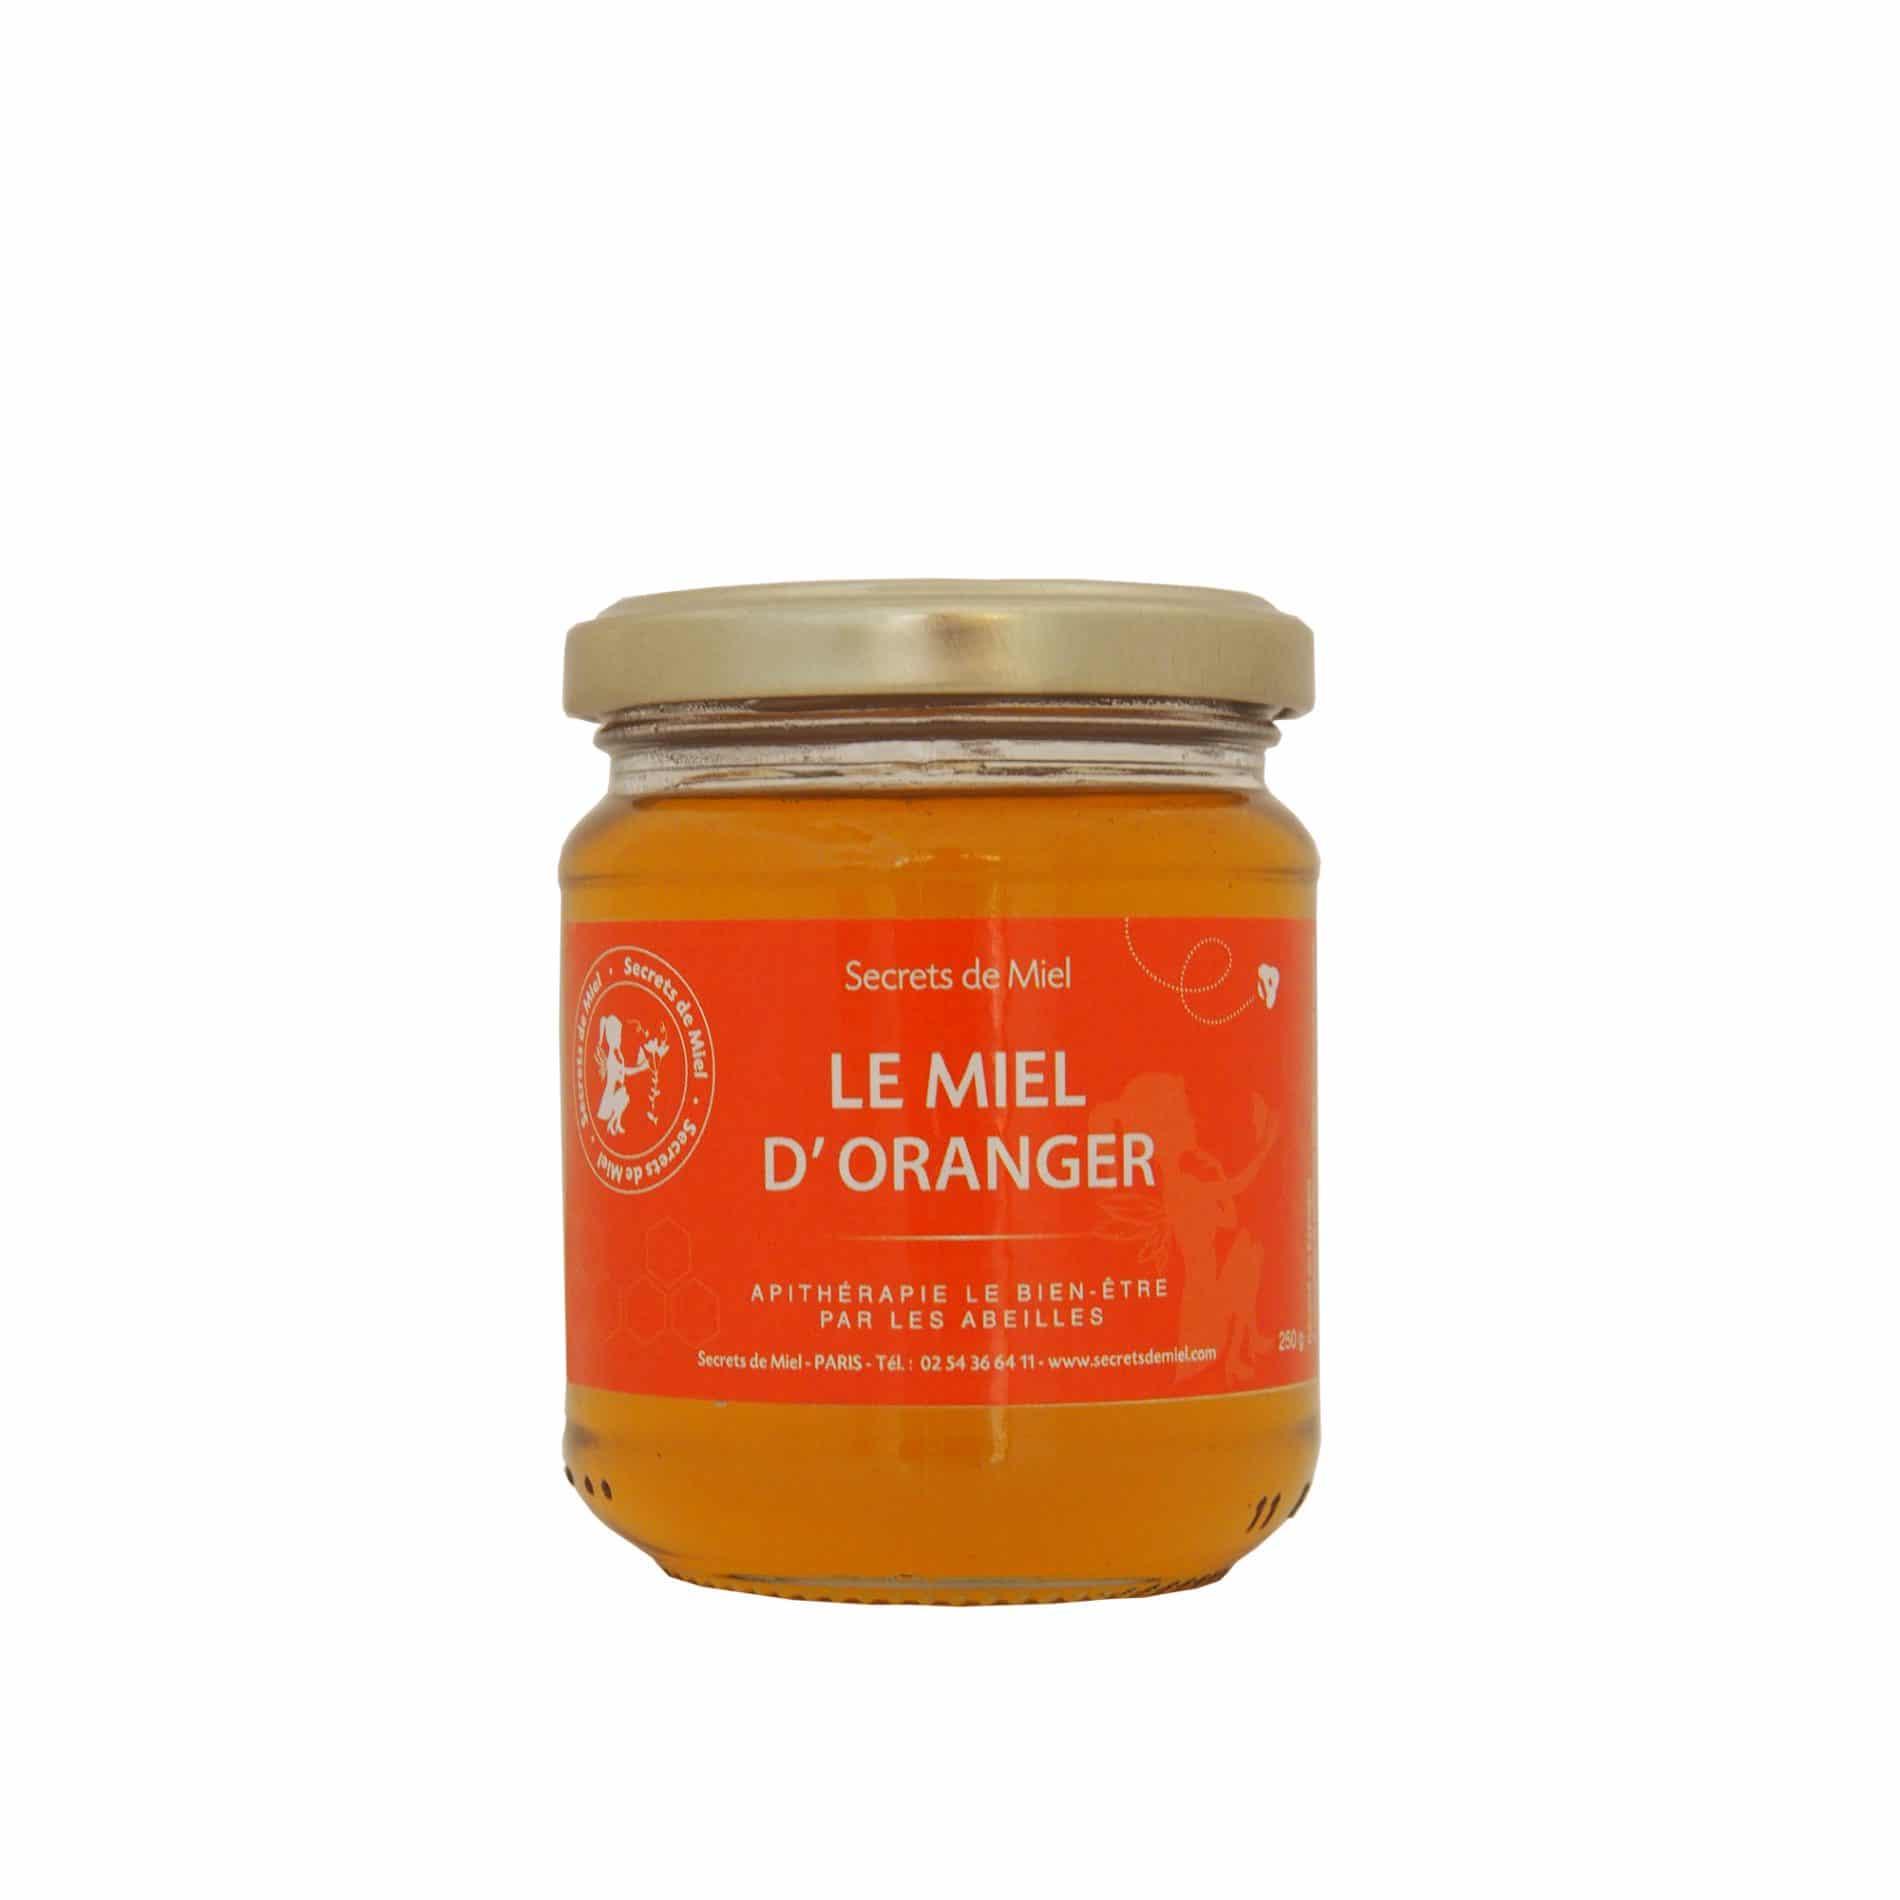 Miel d'Oranger - Miel liquide - Abeilles - Ruche - Produit naturel - Secrets de Miel